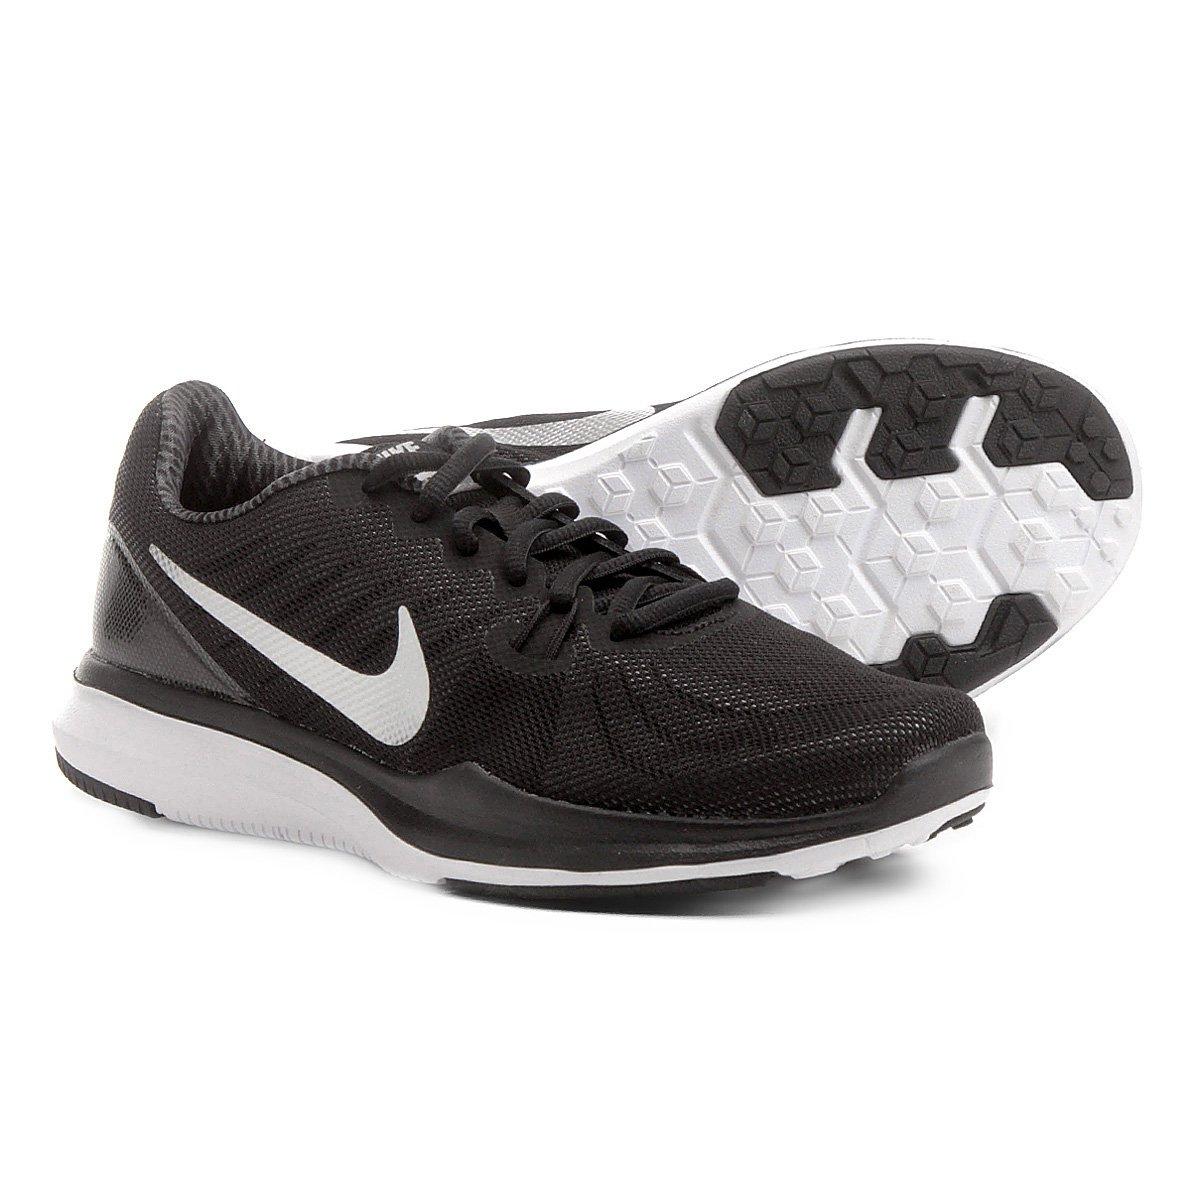 Tênis Nike In-Season TR 7 Feminino - Compre Agora  a64b7939e0